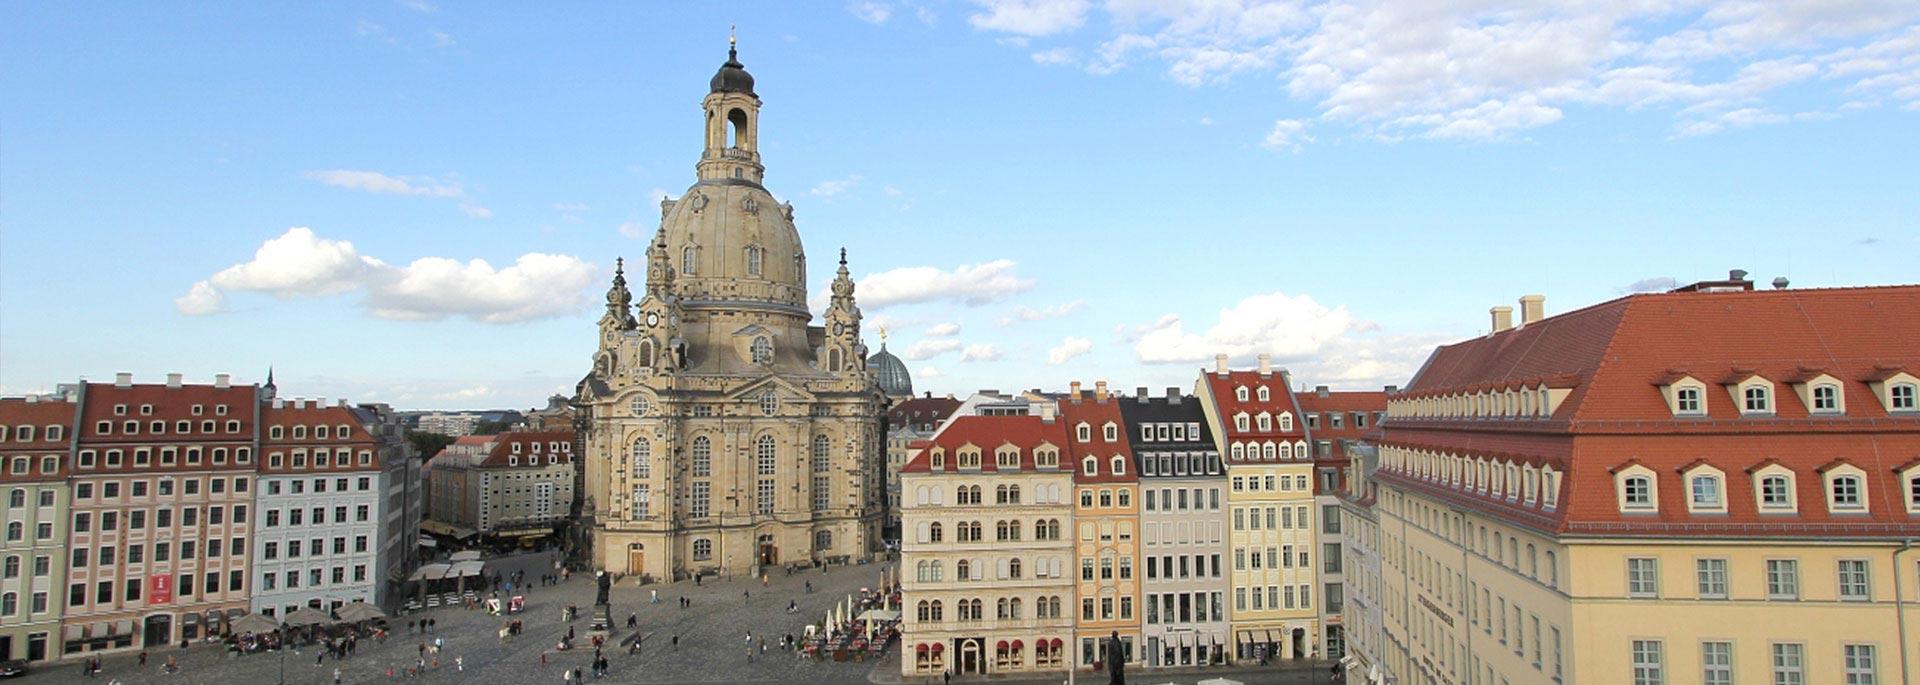 der IMMOBILIENMakler - Frauenkirche